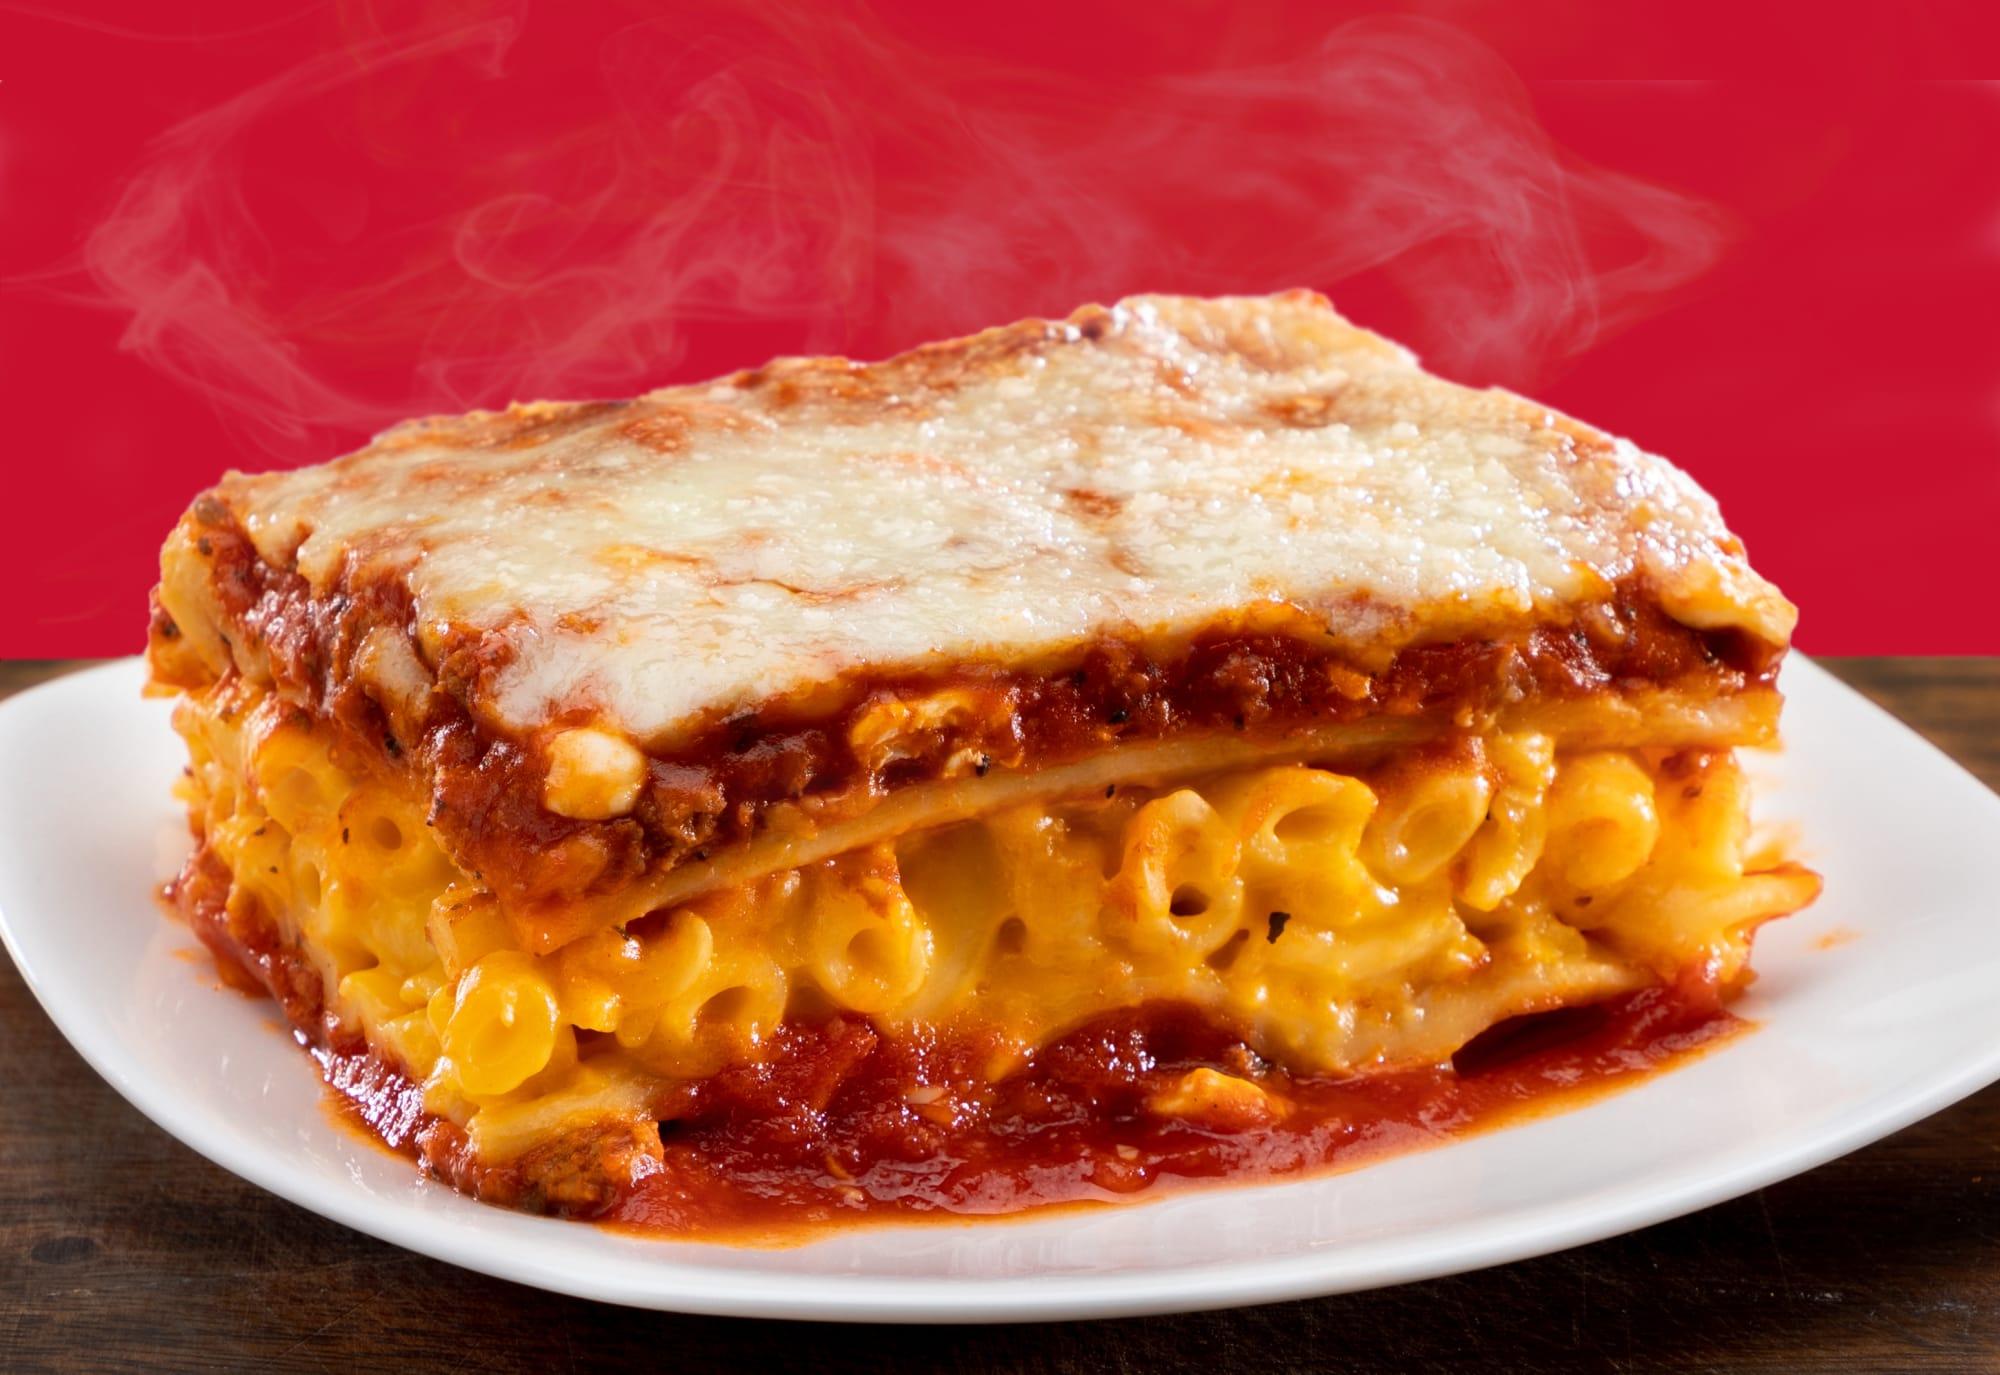 Stouffer's creates new LasagnaMac mashup